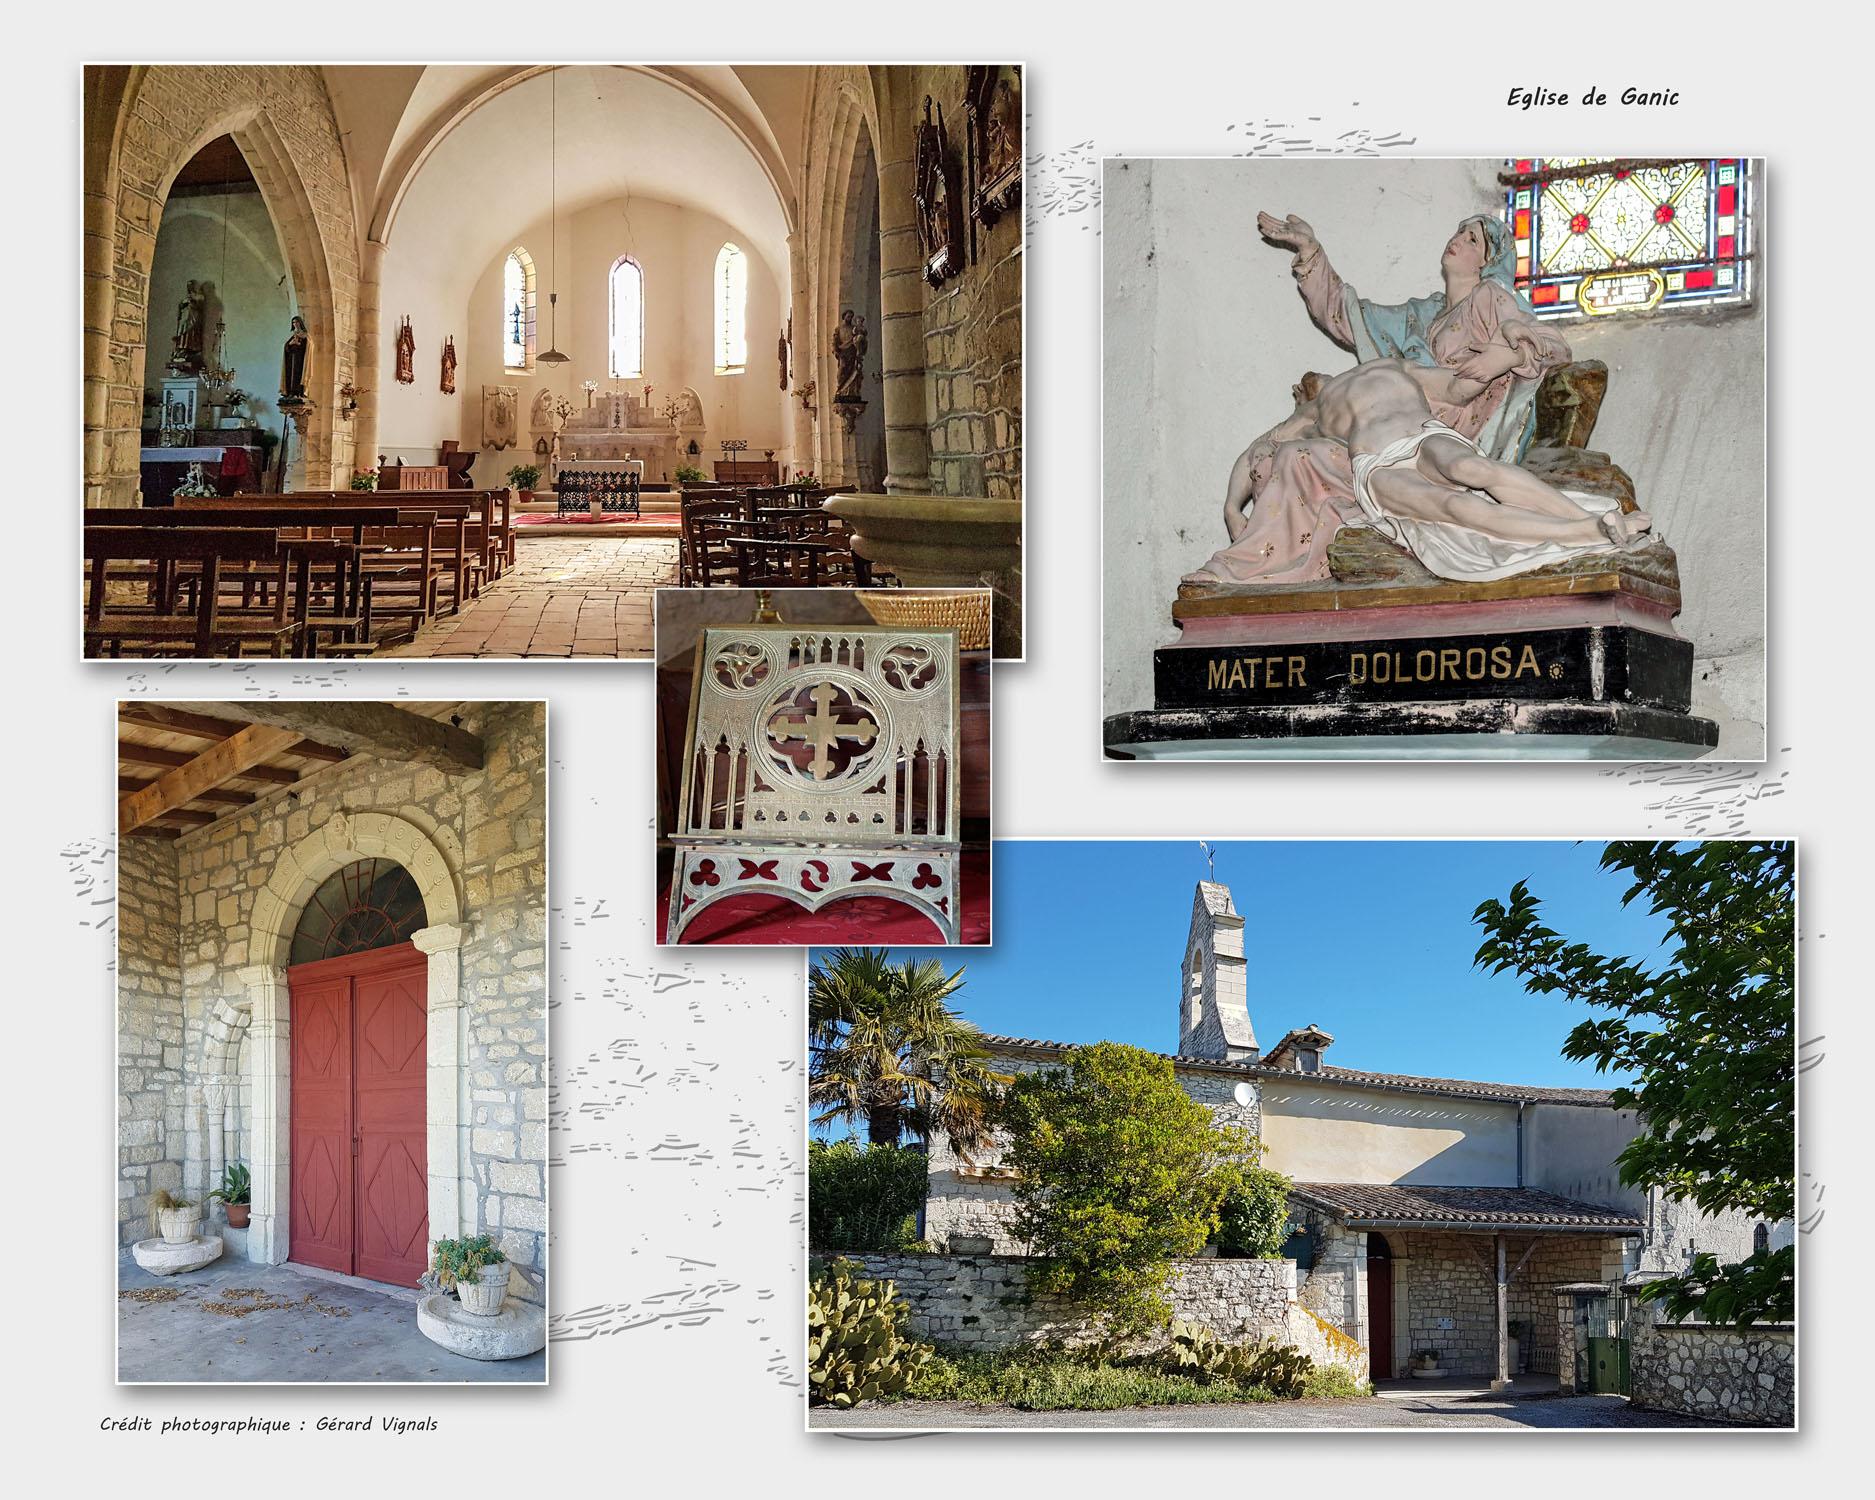 Eglise de Ganic